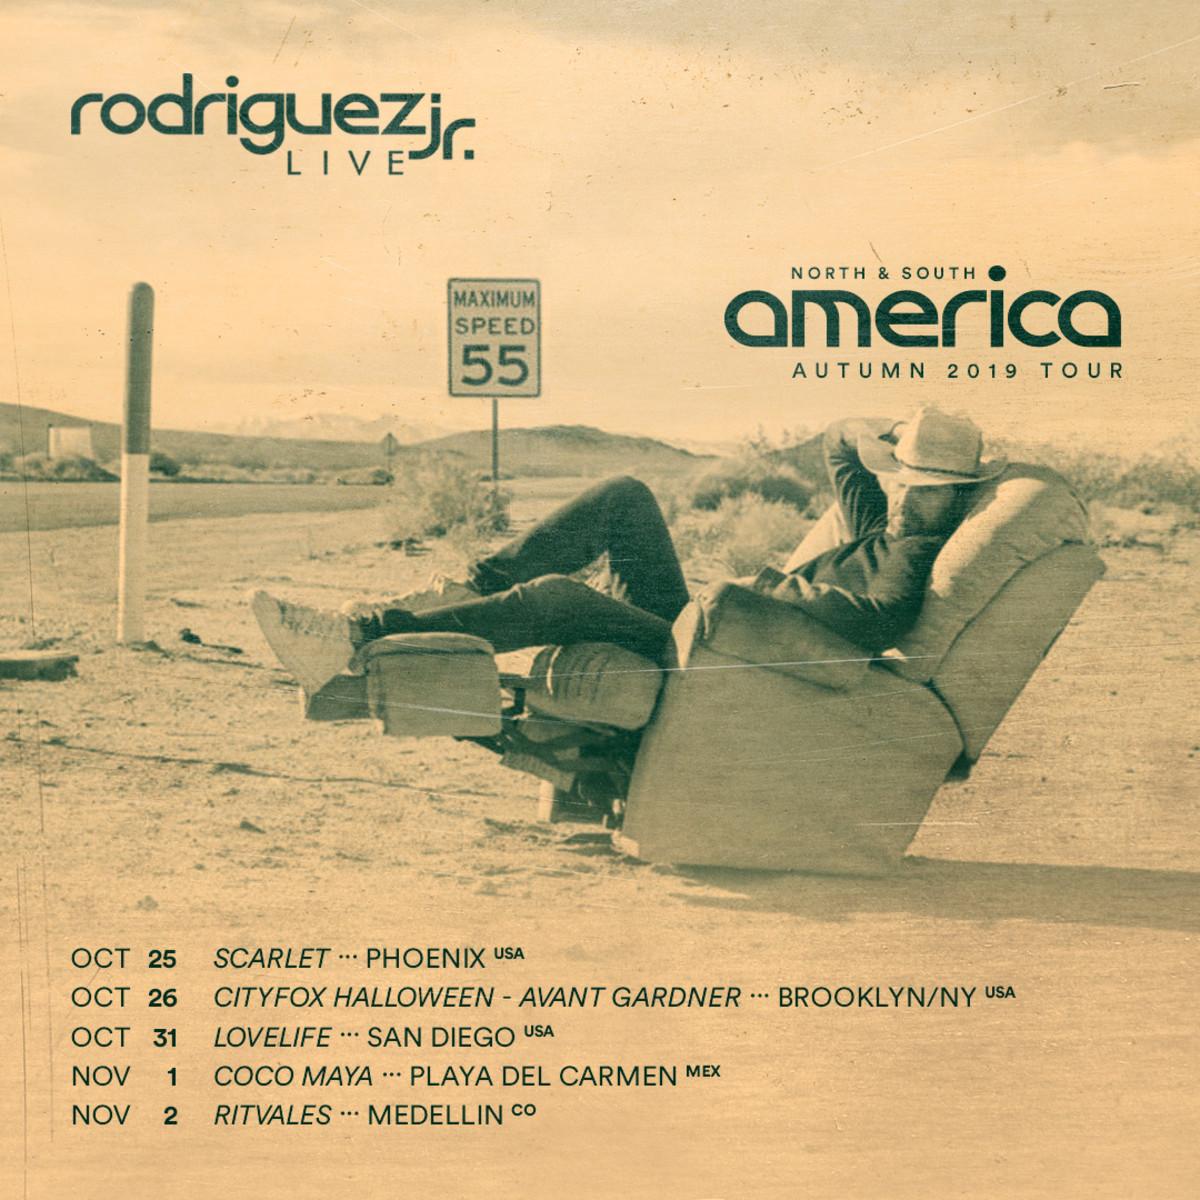 RodriguezJr_tourdates